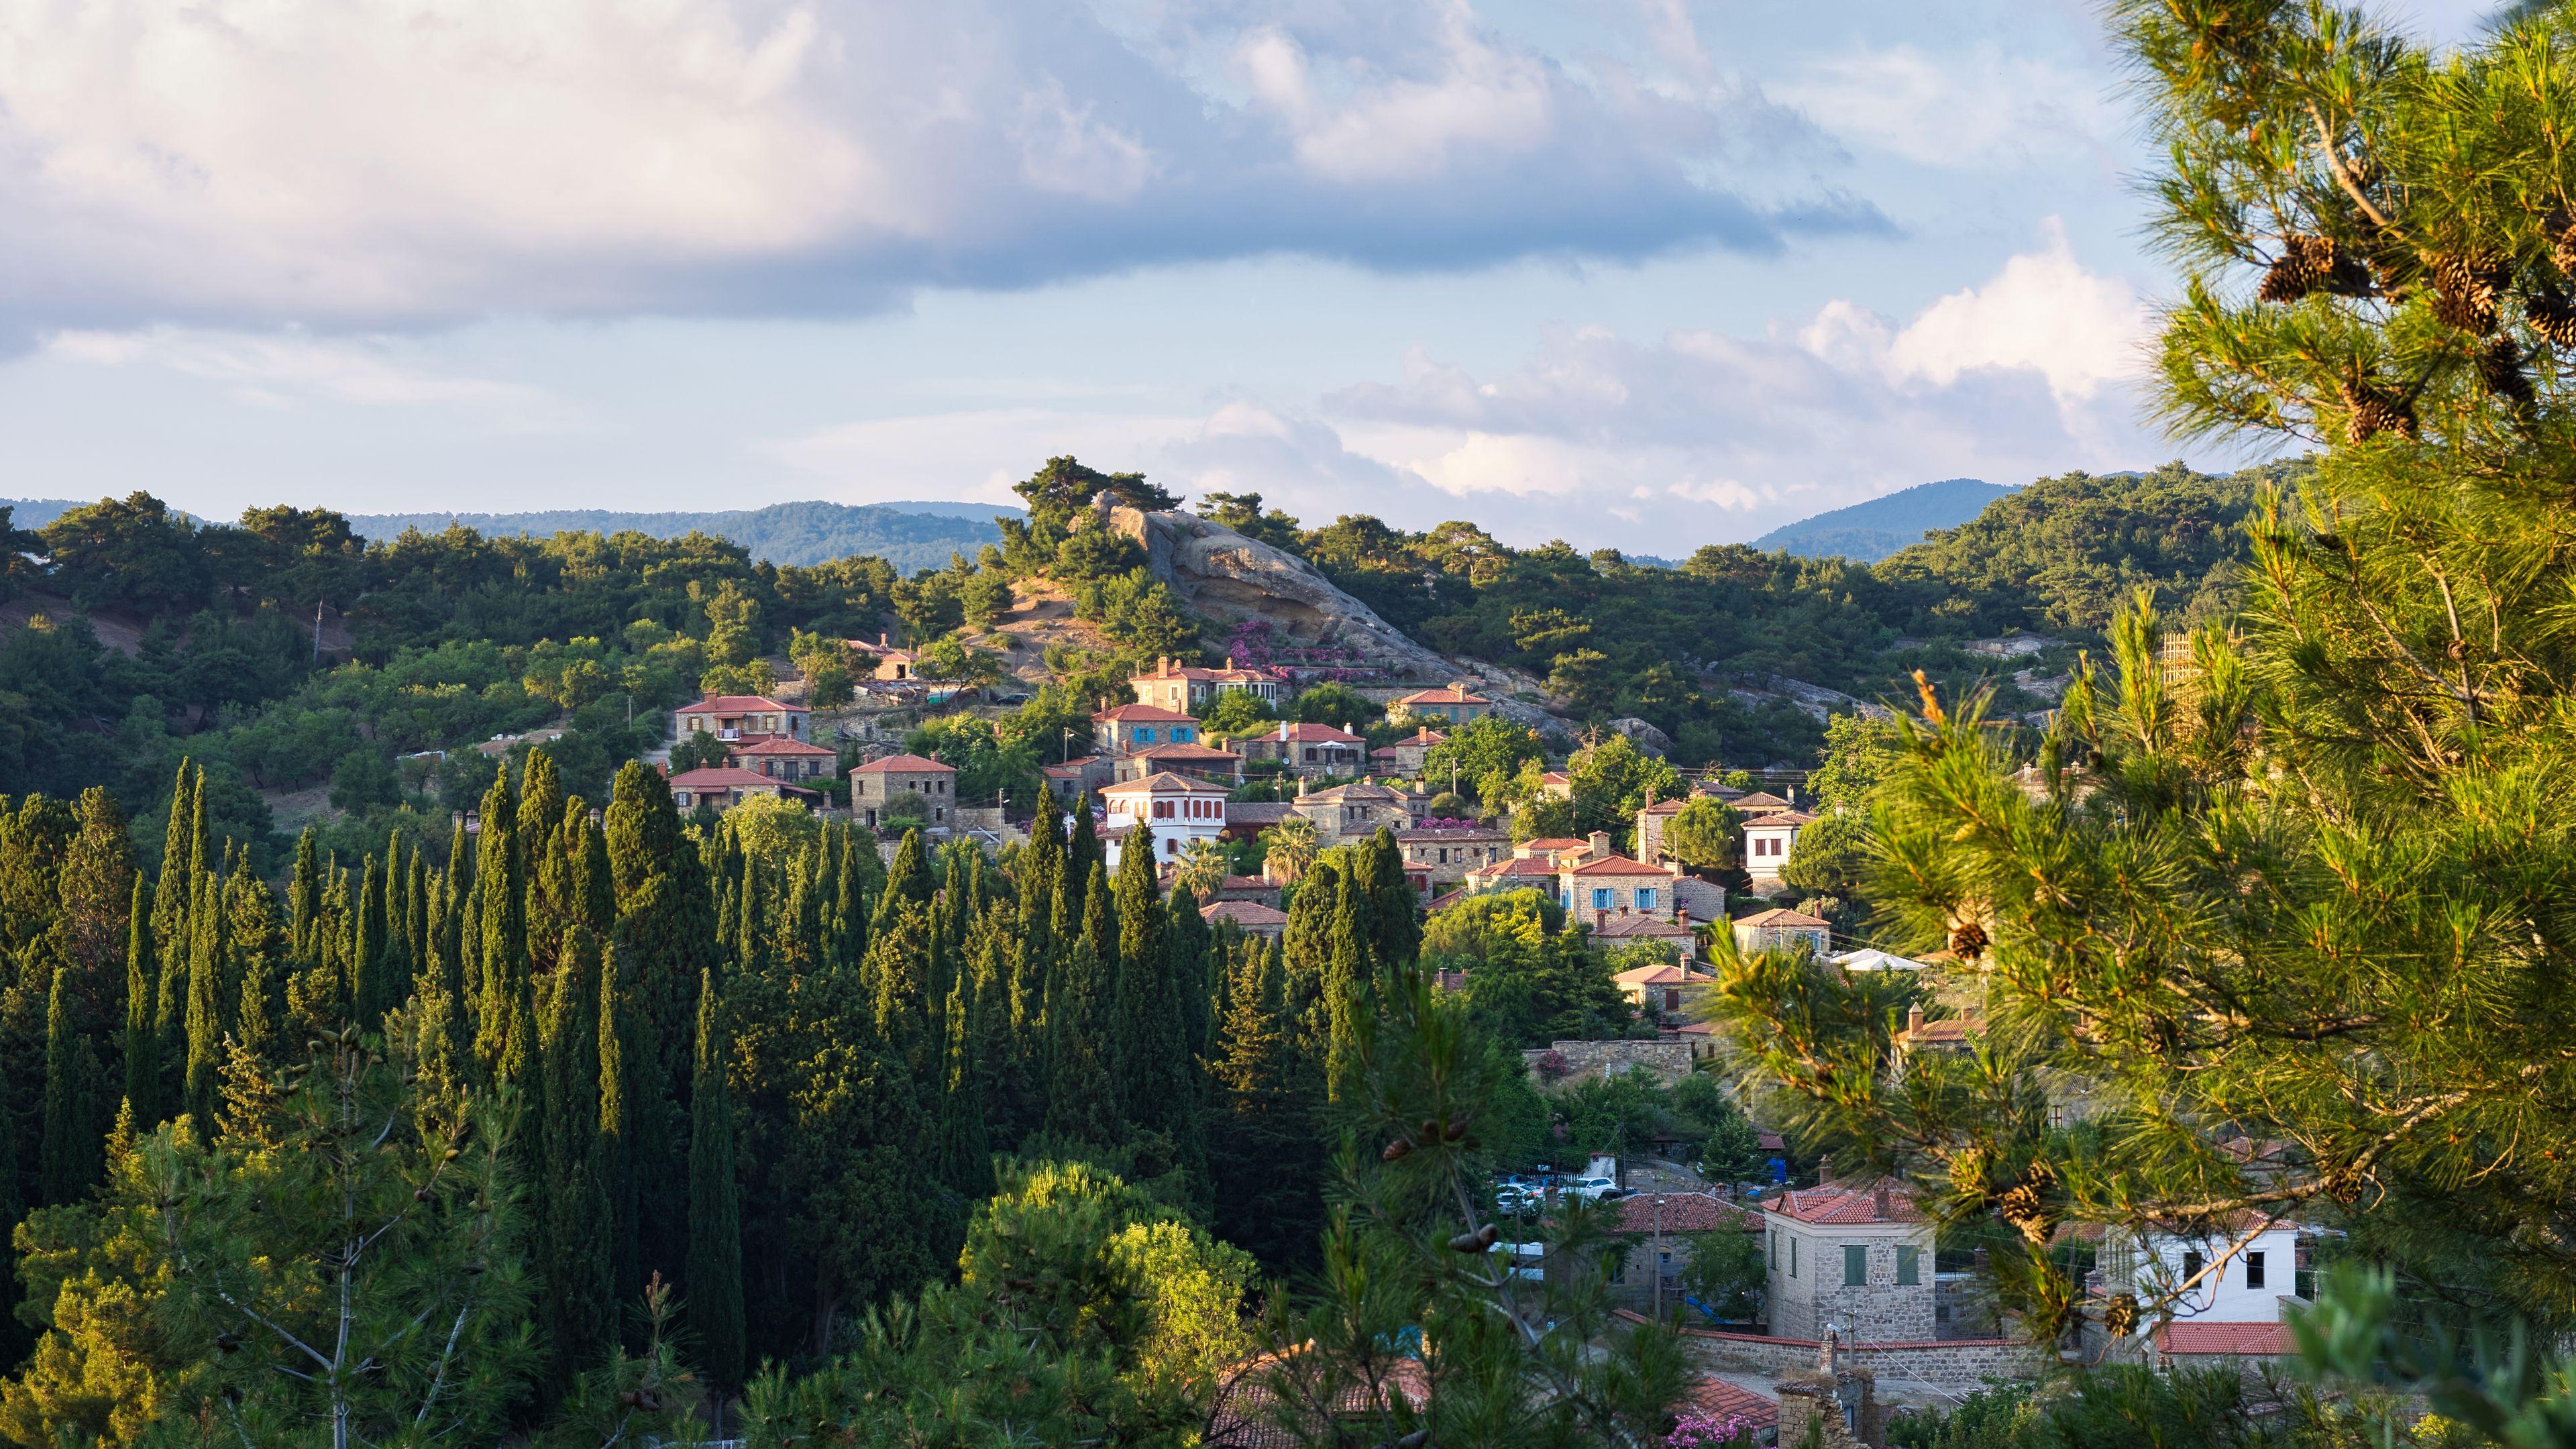 3840x2160 Wallpaper village, mountain, buildings, trees